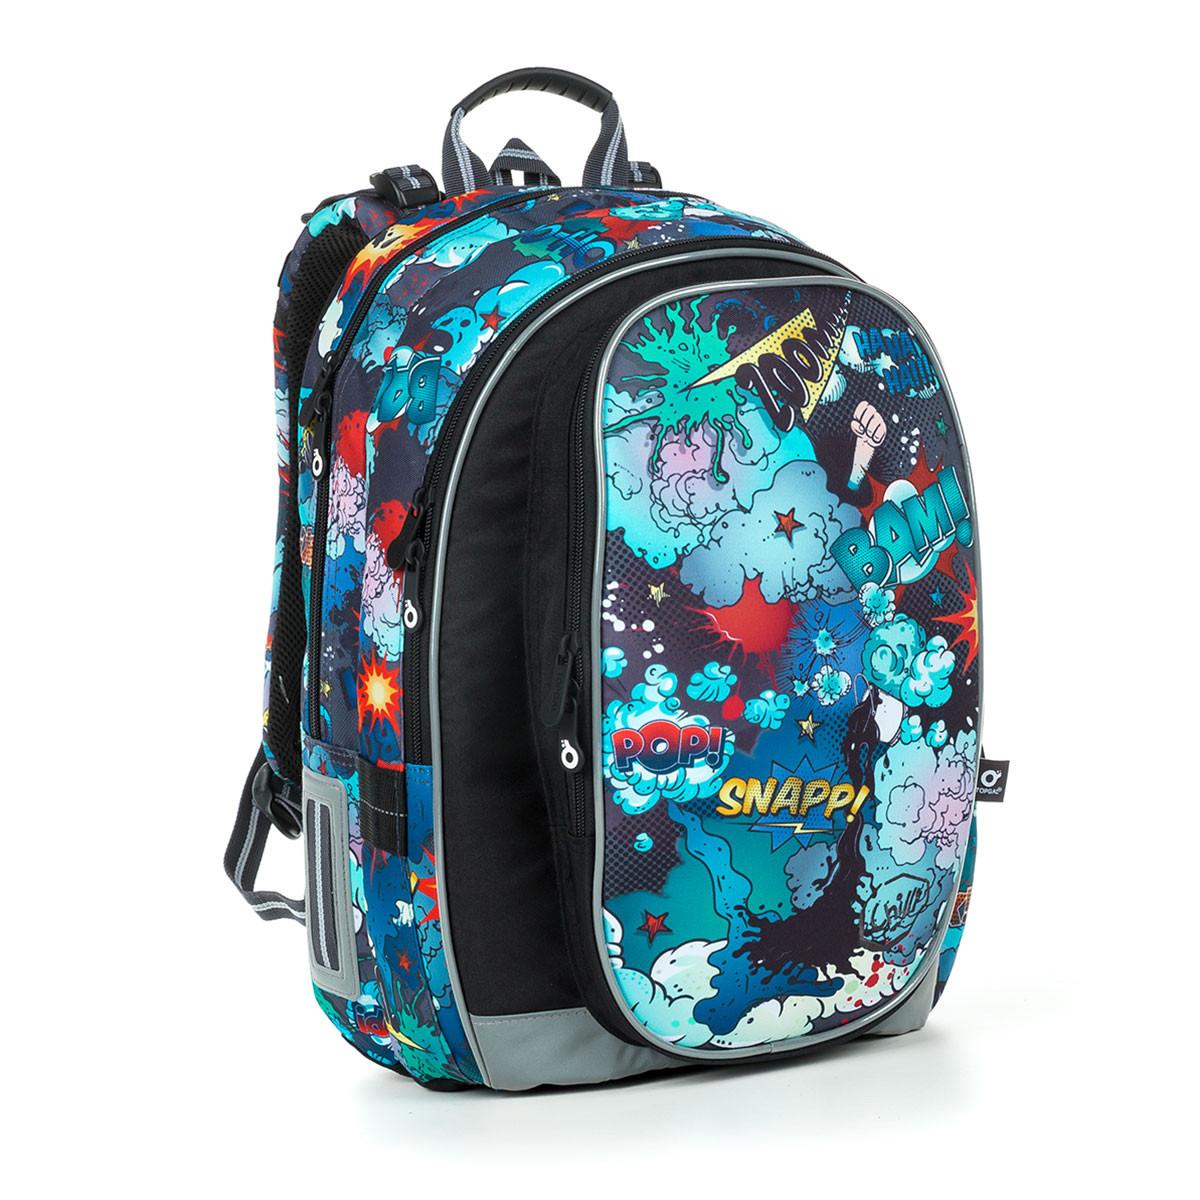 Školní batoh Topgal MIRA 19019 B  d78f61ba8b